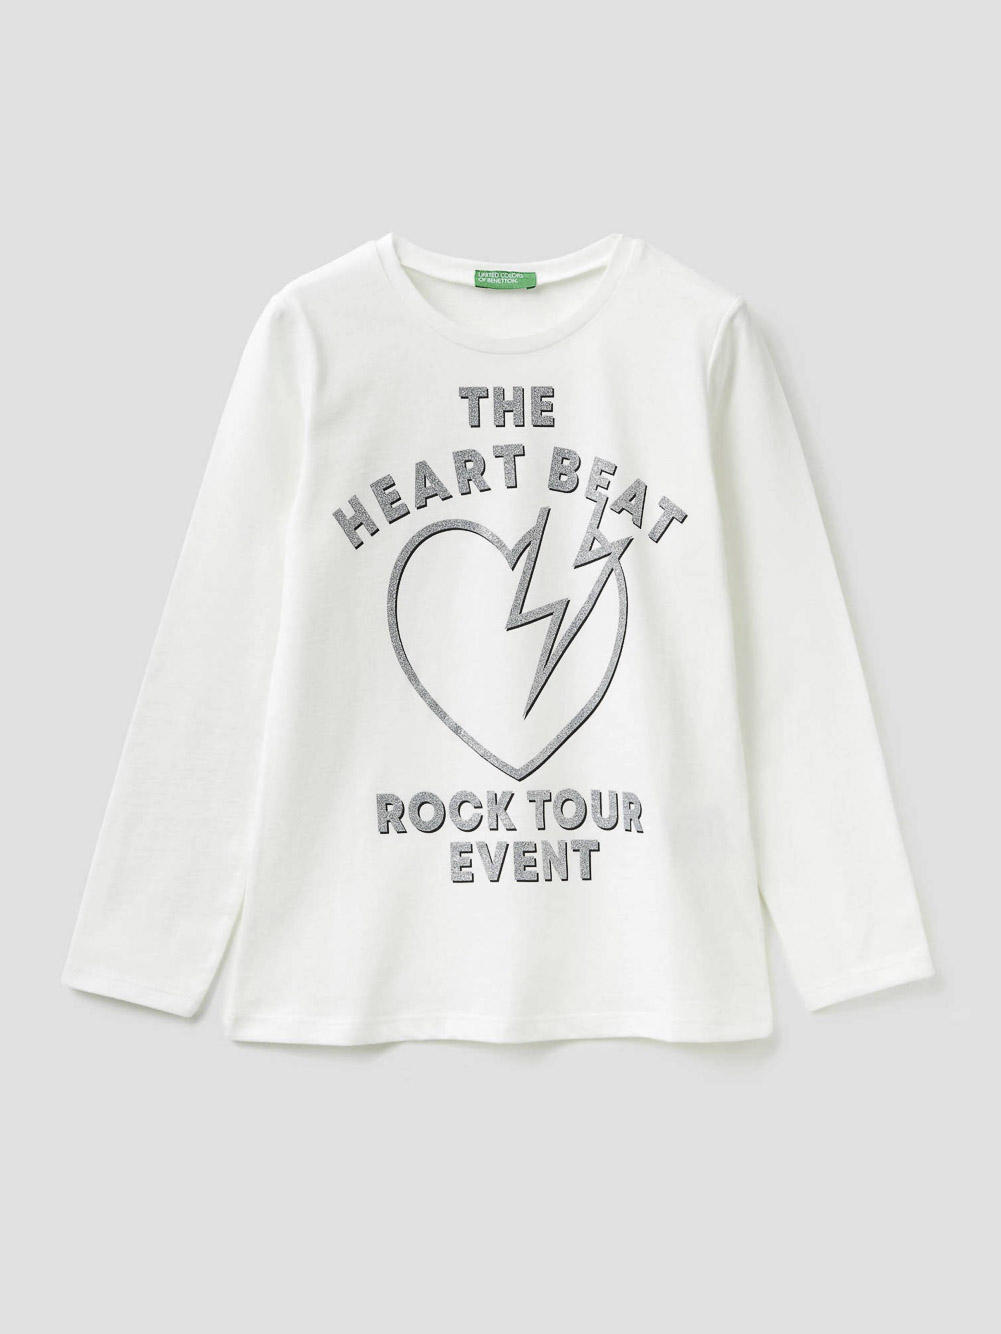 012 BENETTON T-shirt με glitter τύπωμα 3VR5C14Y4 20A074